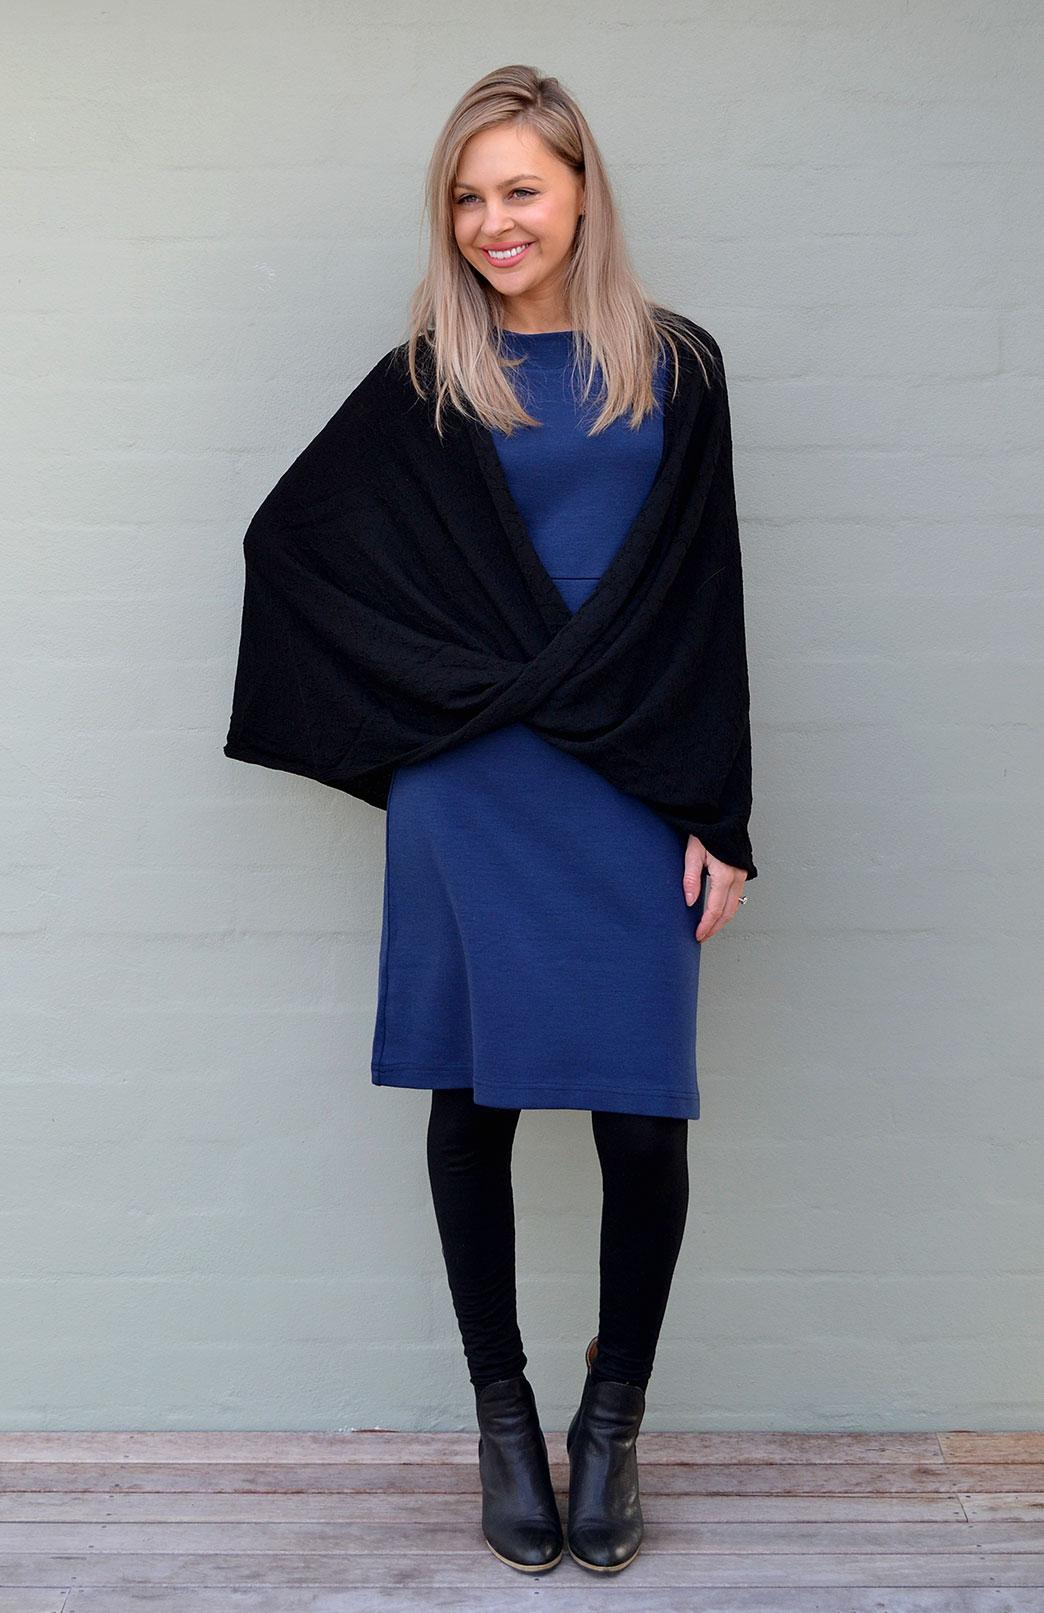 Merino Twisted Wrap - Women's Merino Wool Black Twisted Wrap and Classic Shrug - Smitten Merino Tasmania Australia